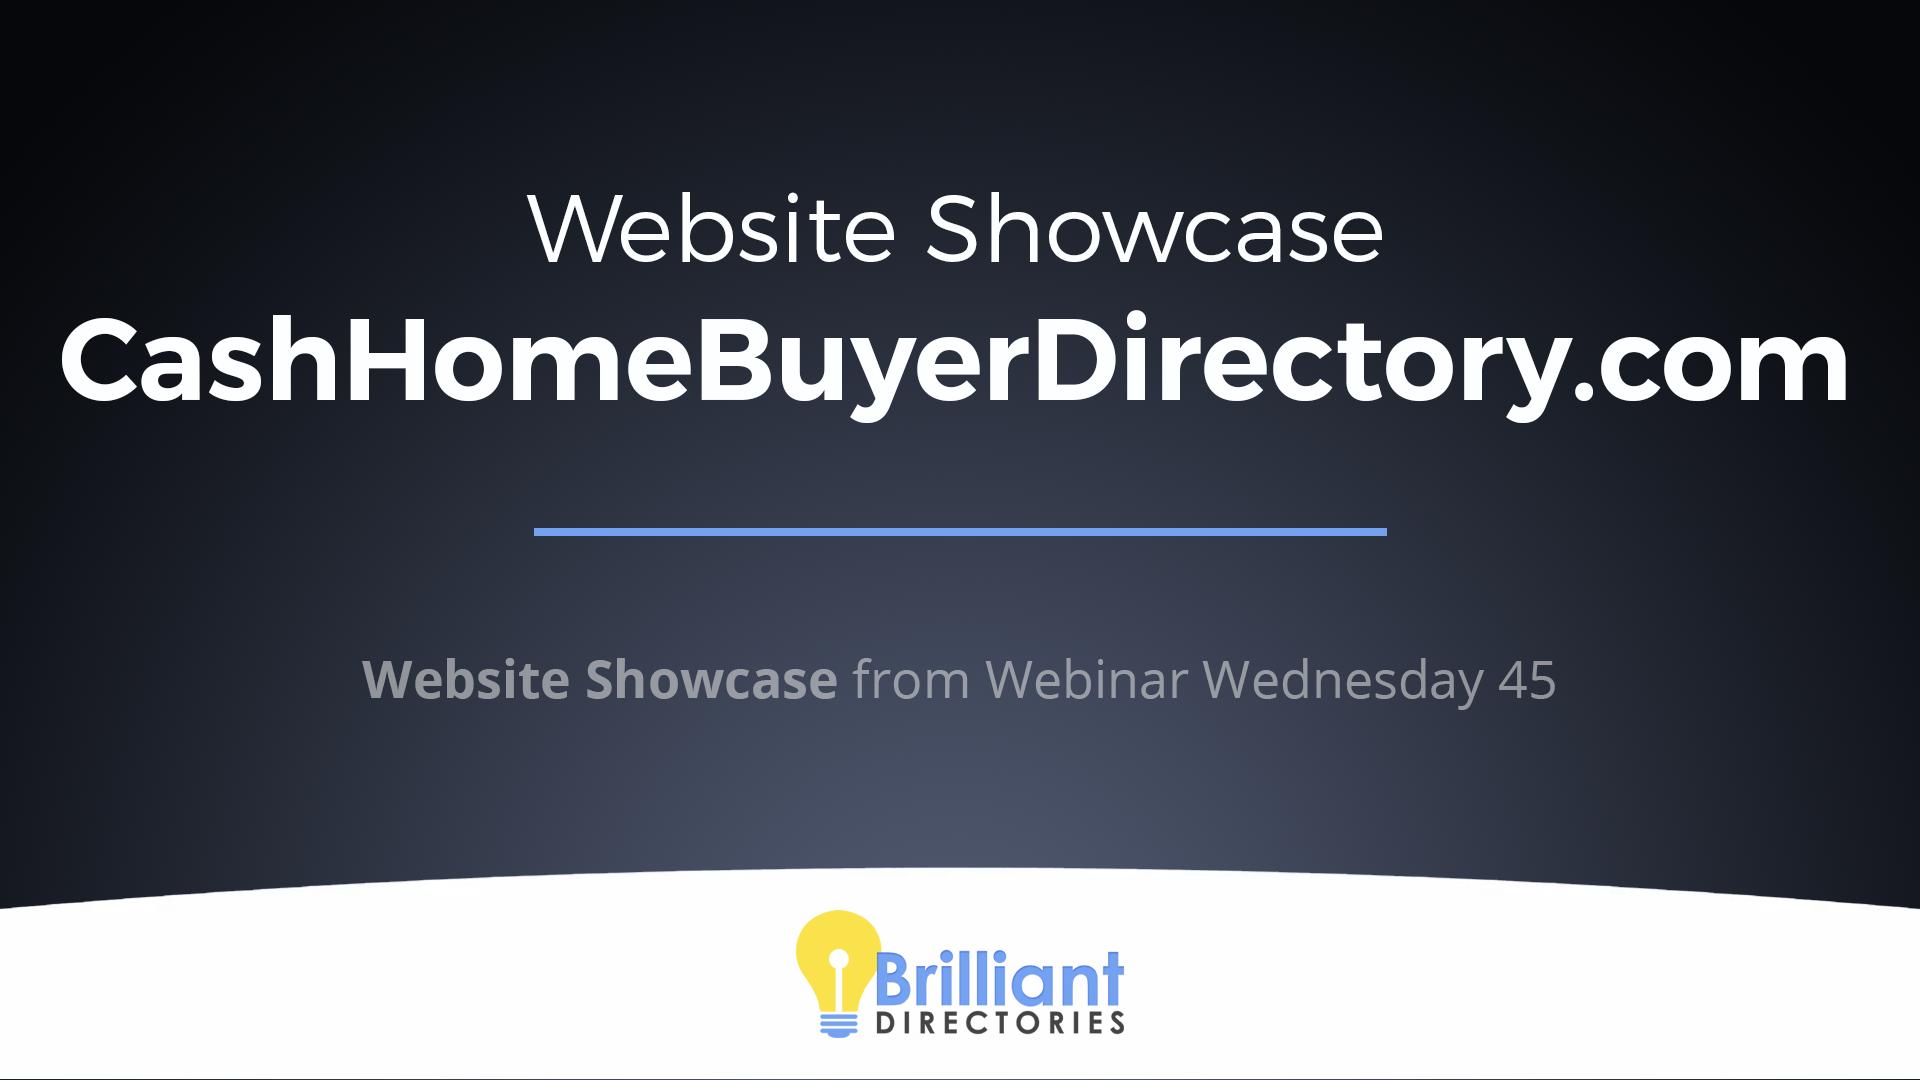 https://www.brilliantdirectories.com/blog/case-study-lead-gen-for-home-buyers-powered-by-brilliant-directories